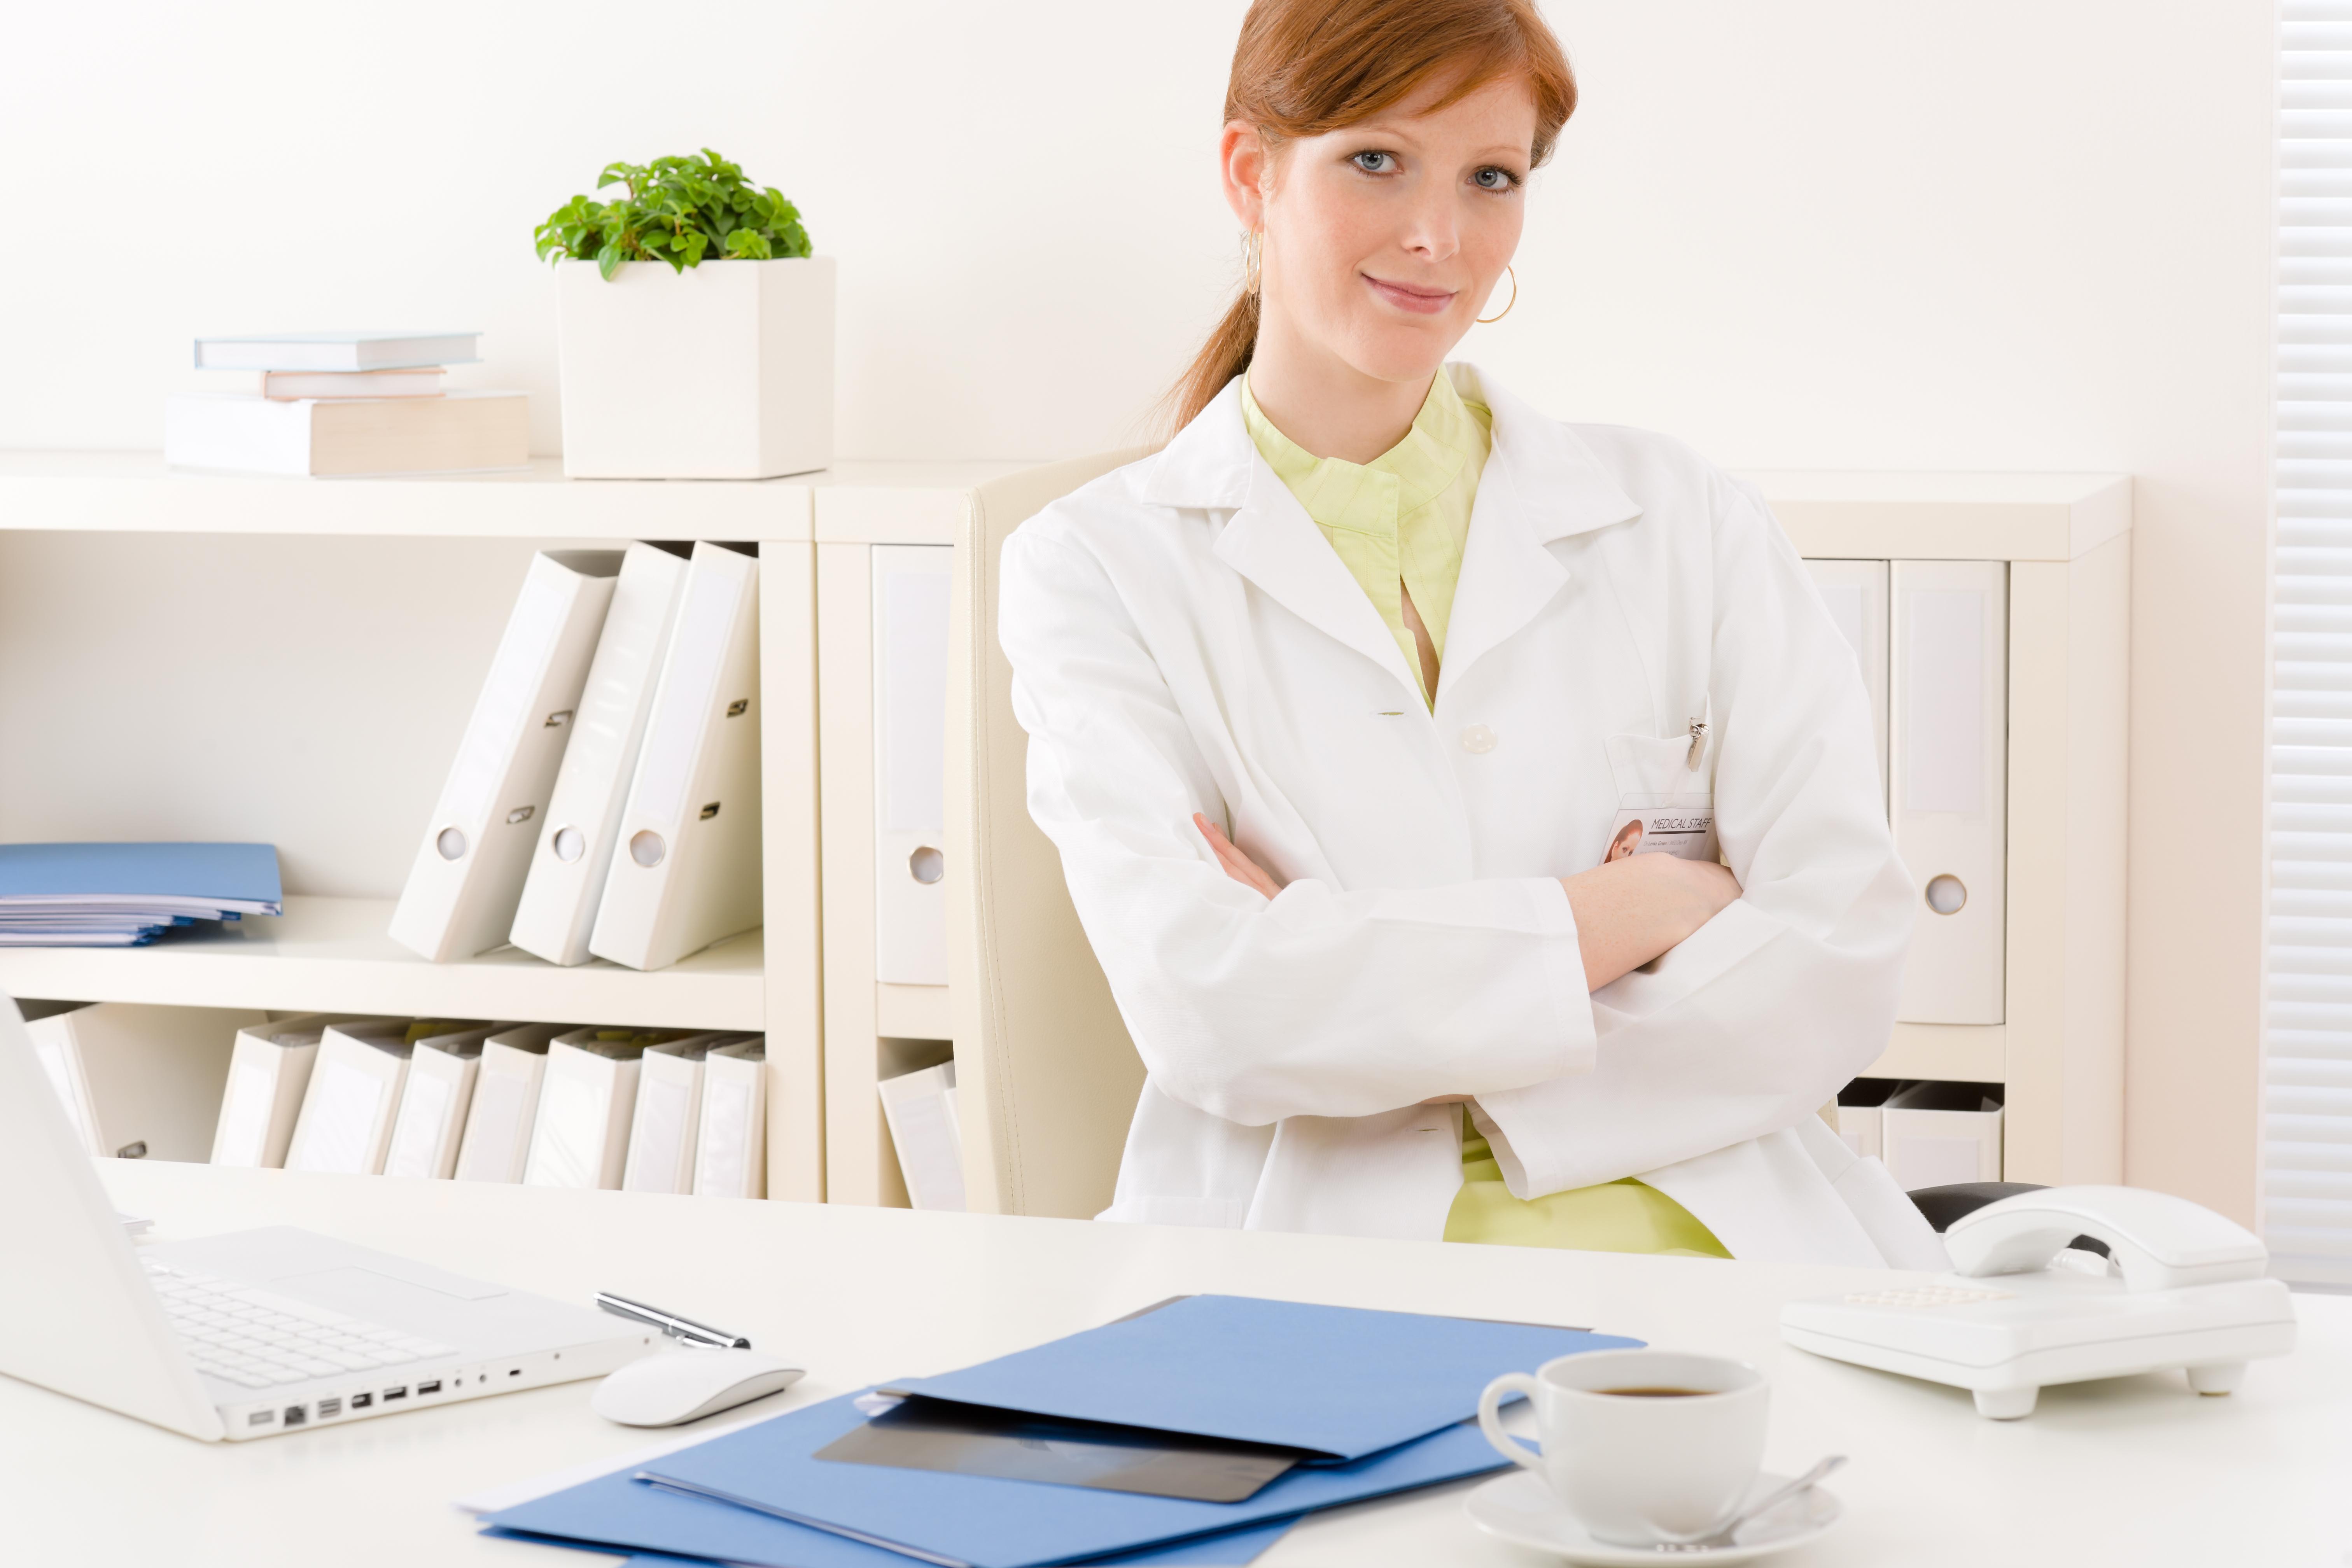 Doctor office - portrait female physician sit by desk